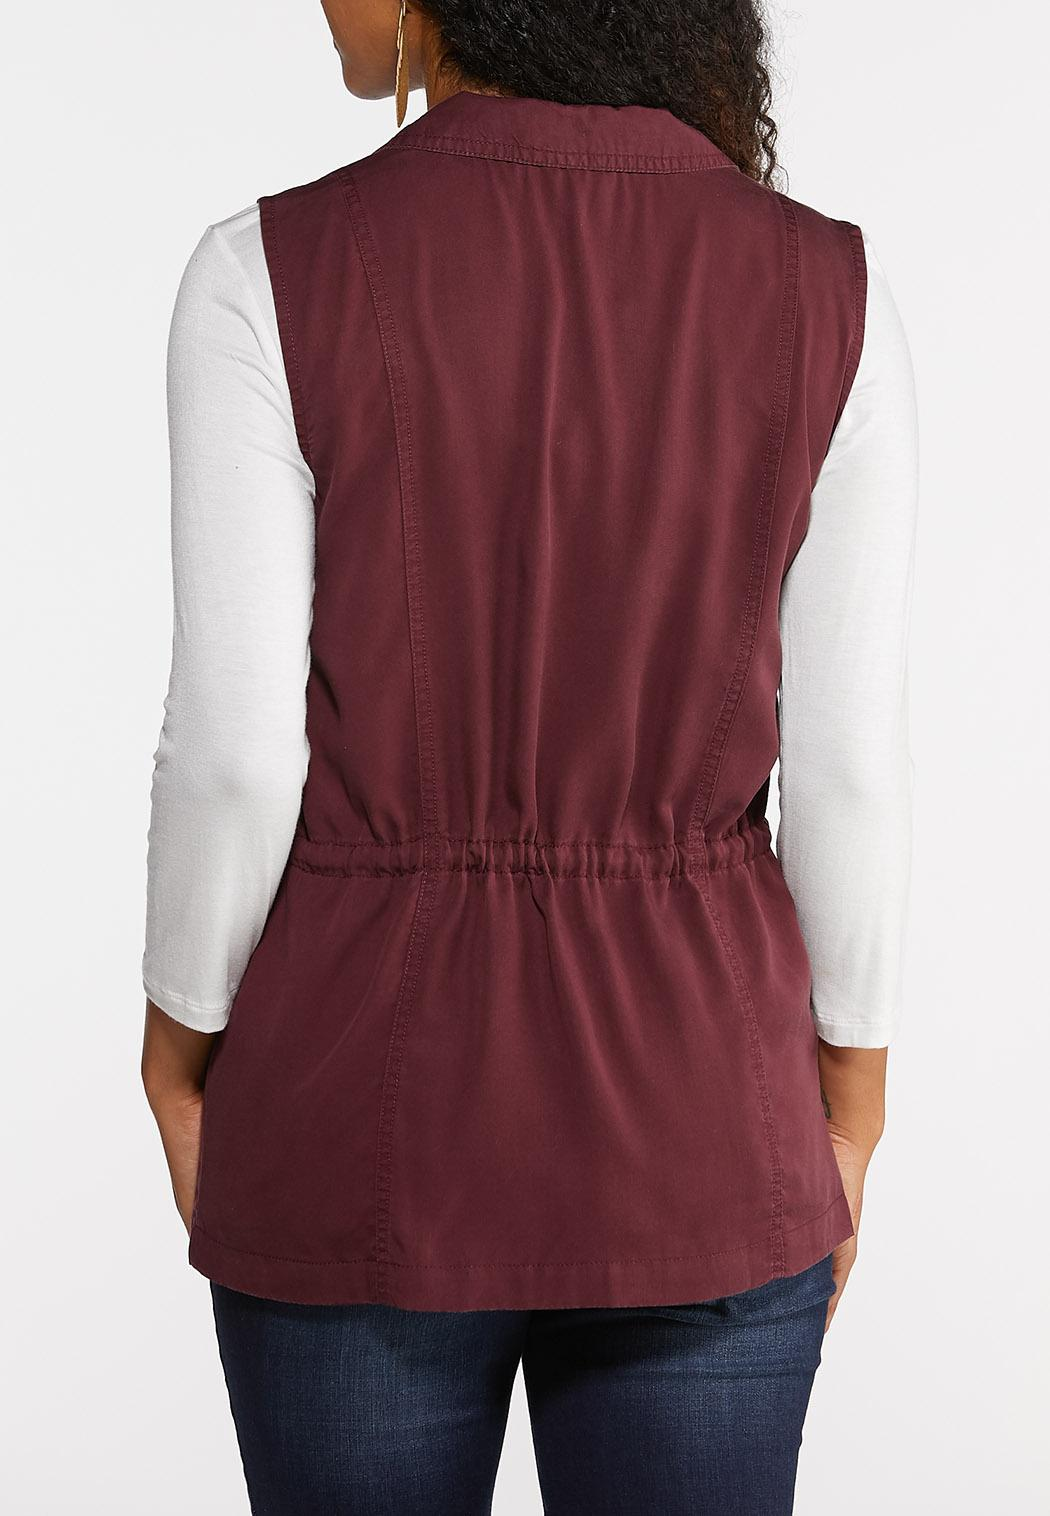 Tencel Utility Vest (Item #43927543)